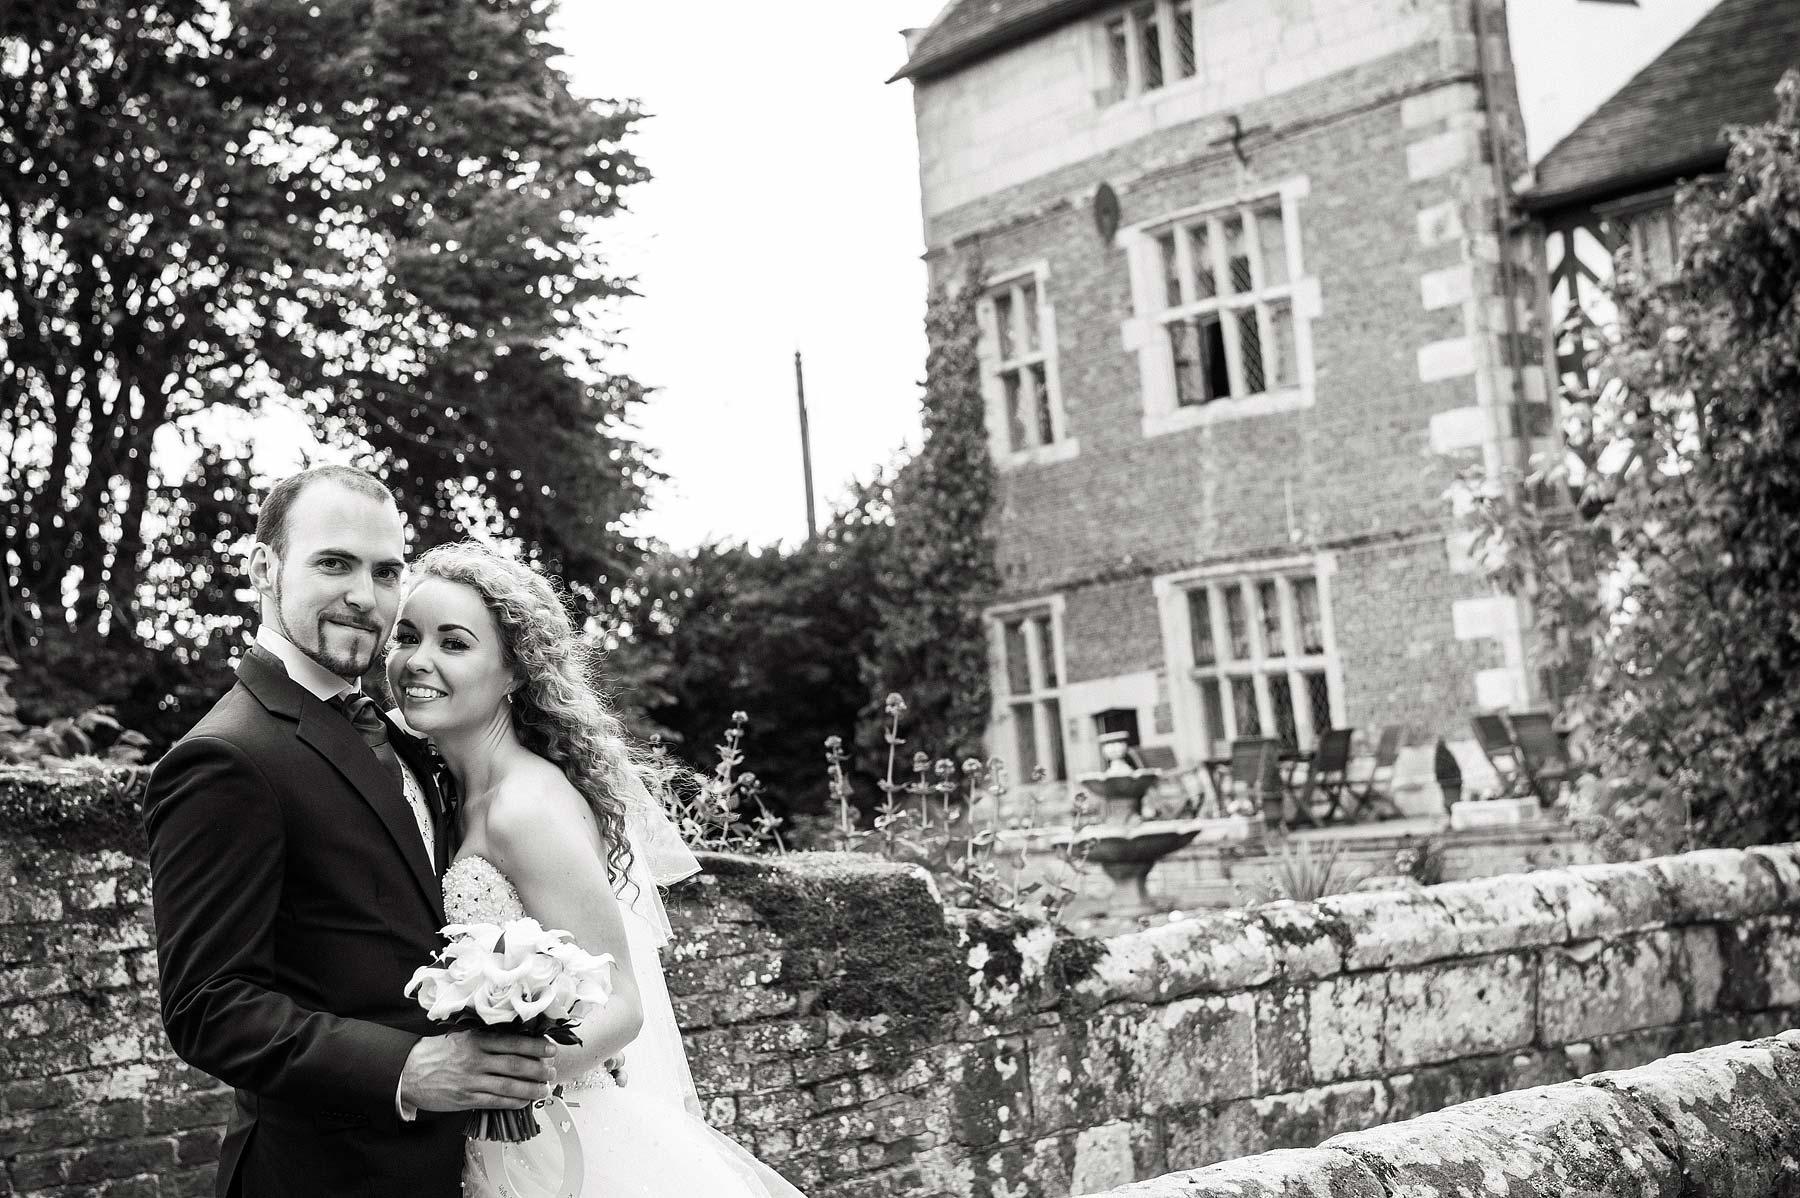 albright-hussey-manor-wedding-photographers-048